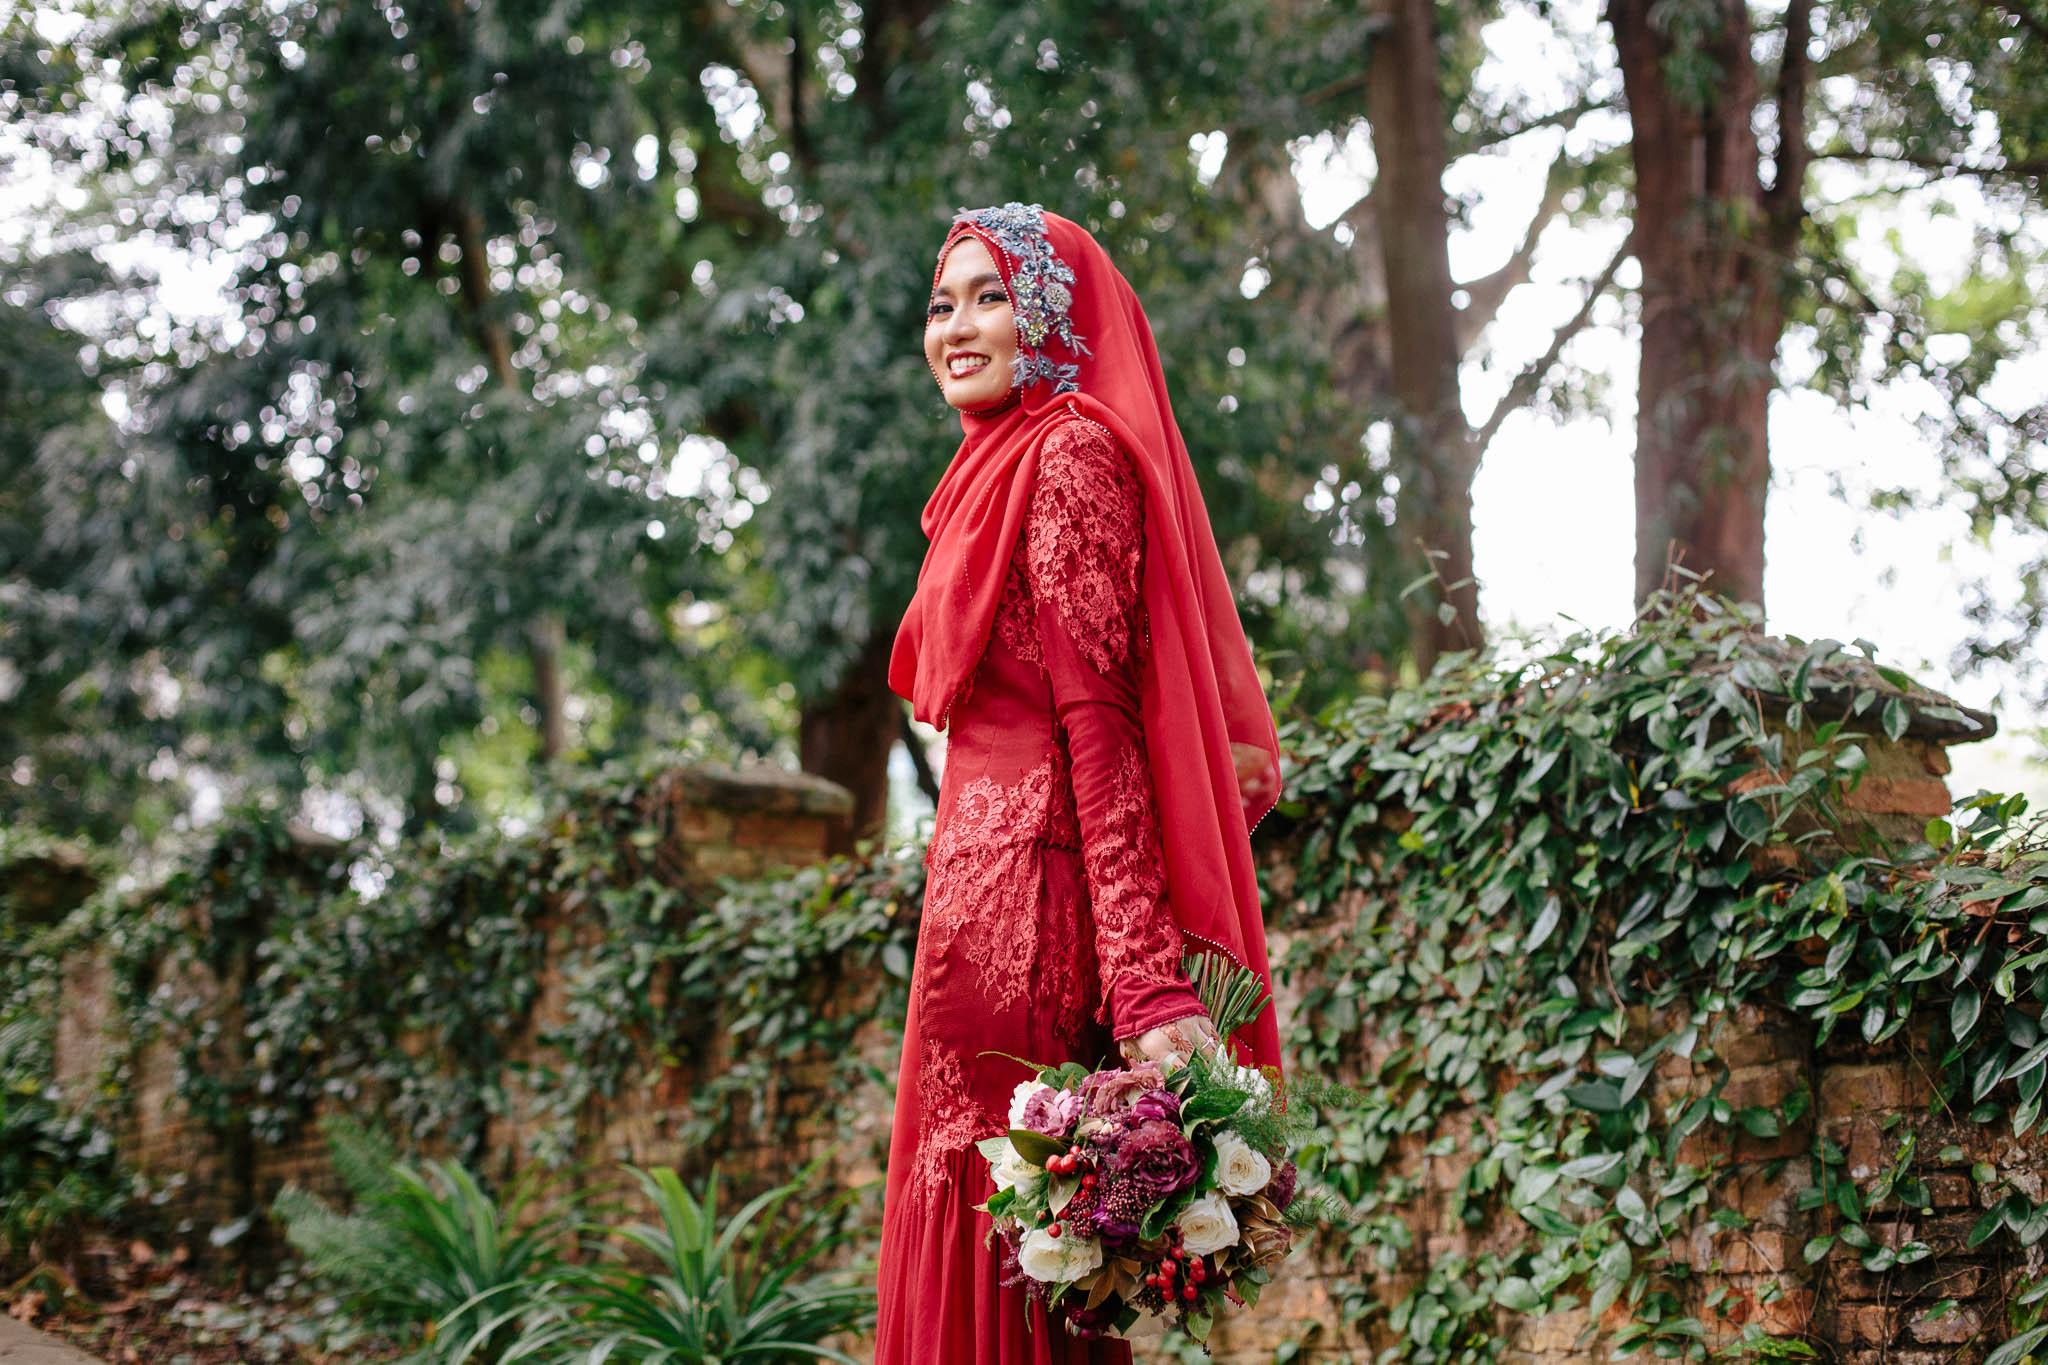 singapore-wedding-photographer-sharalyn-syazwan-067.jpg